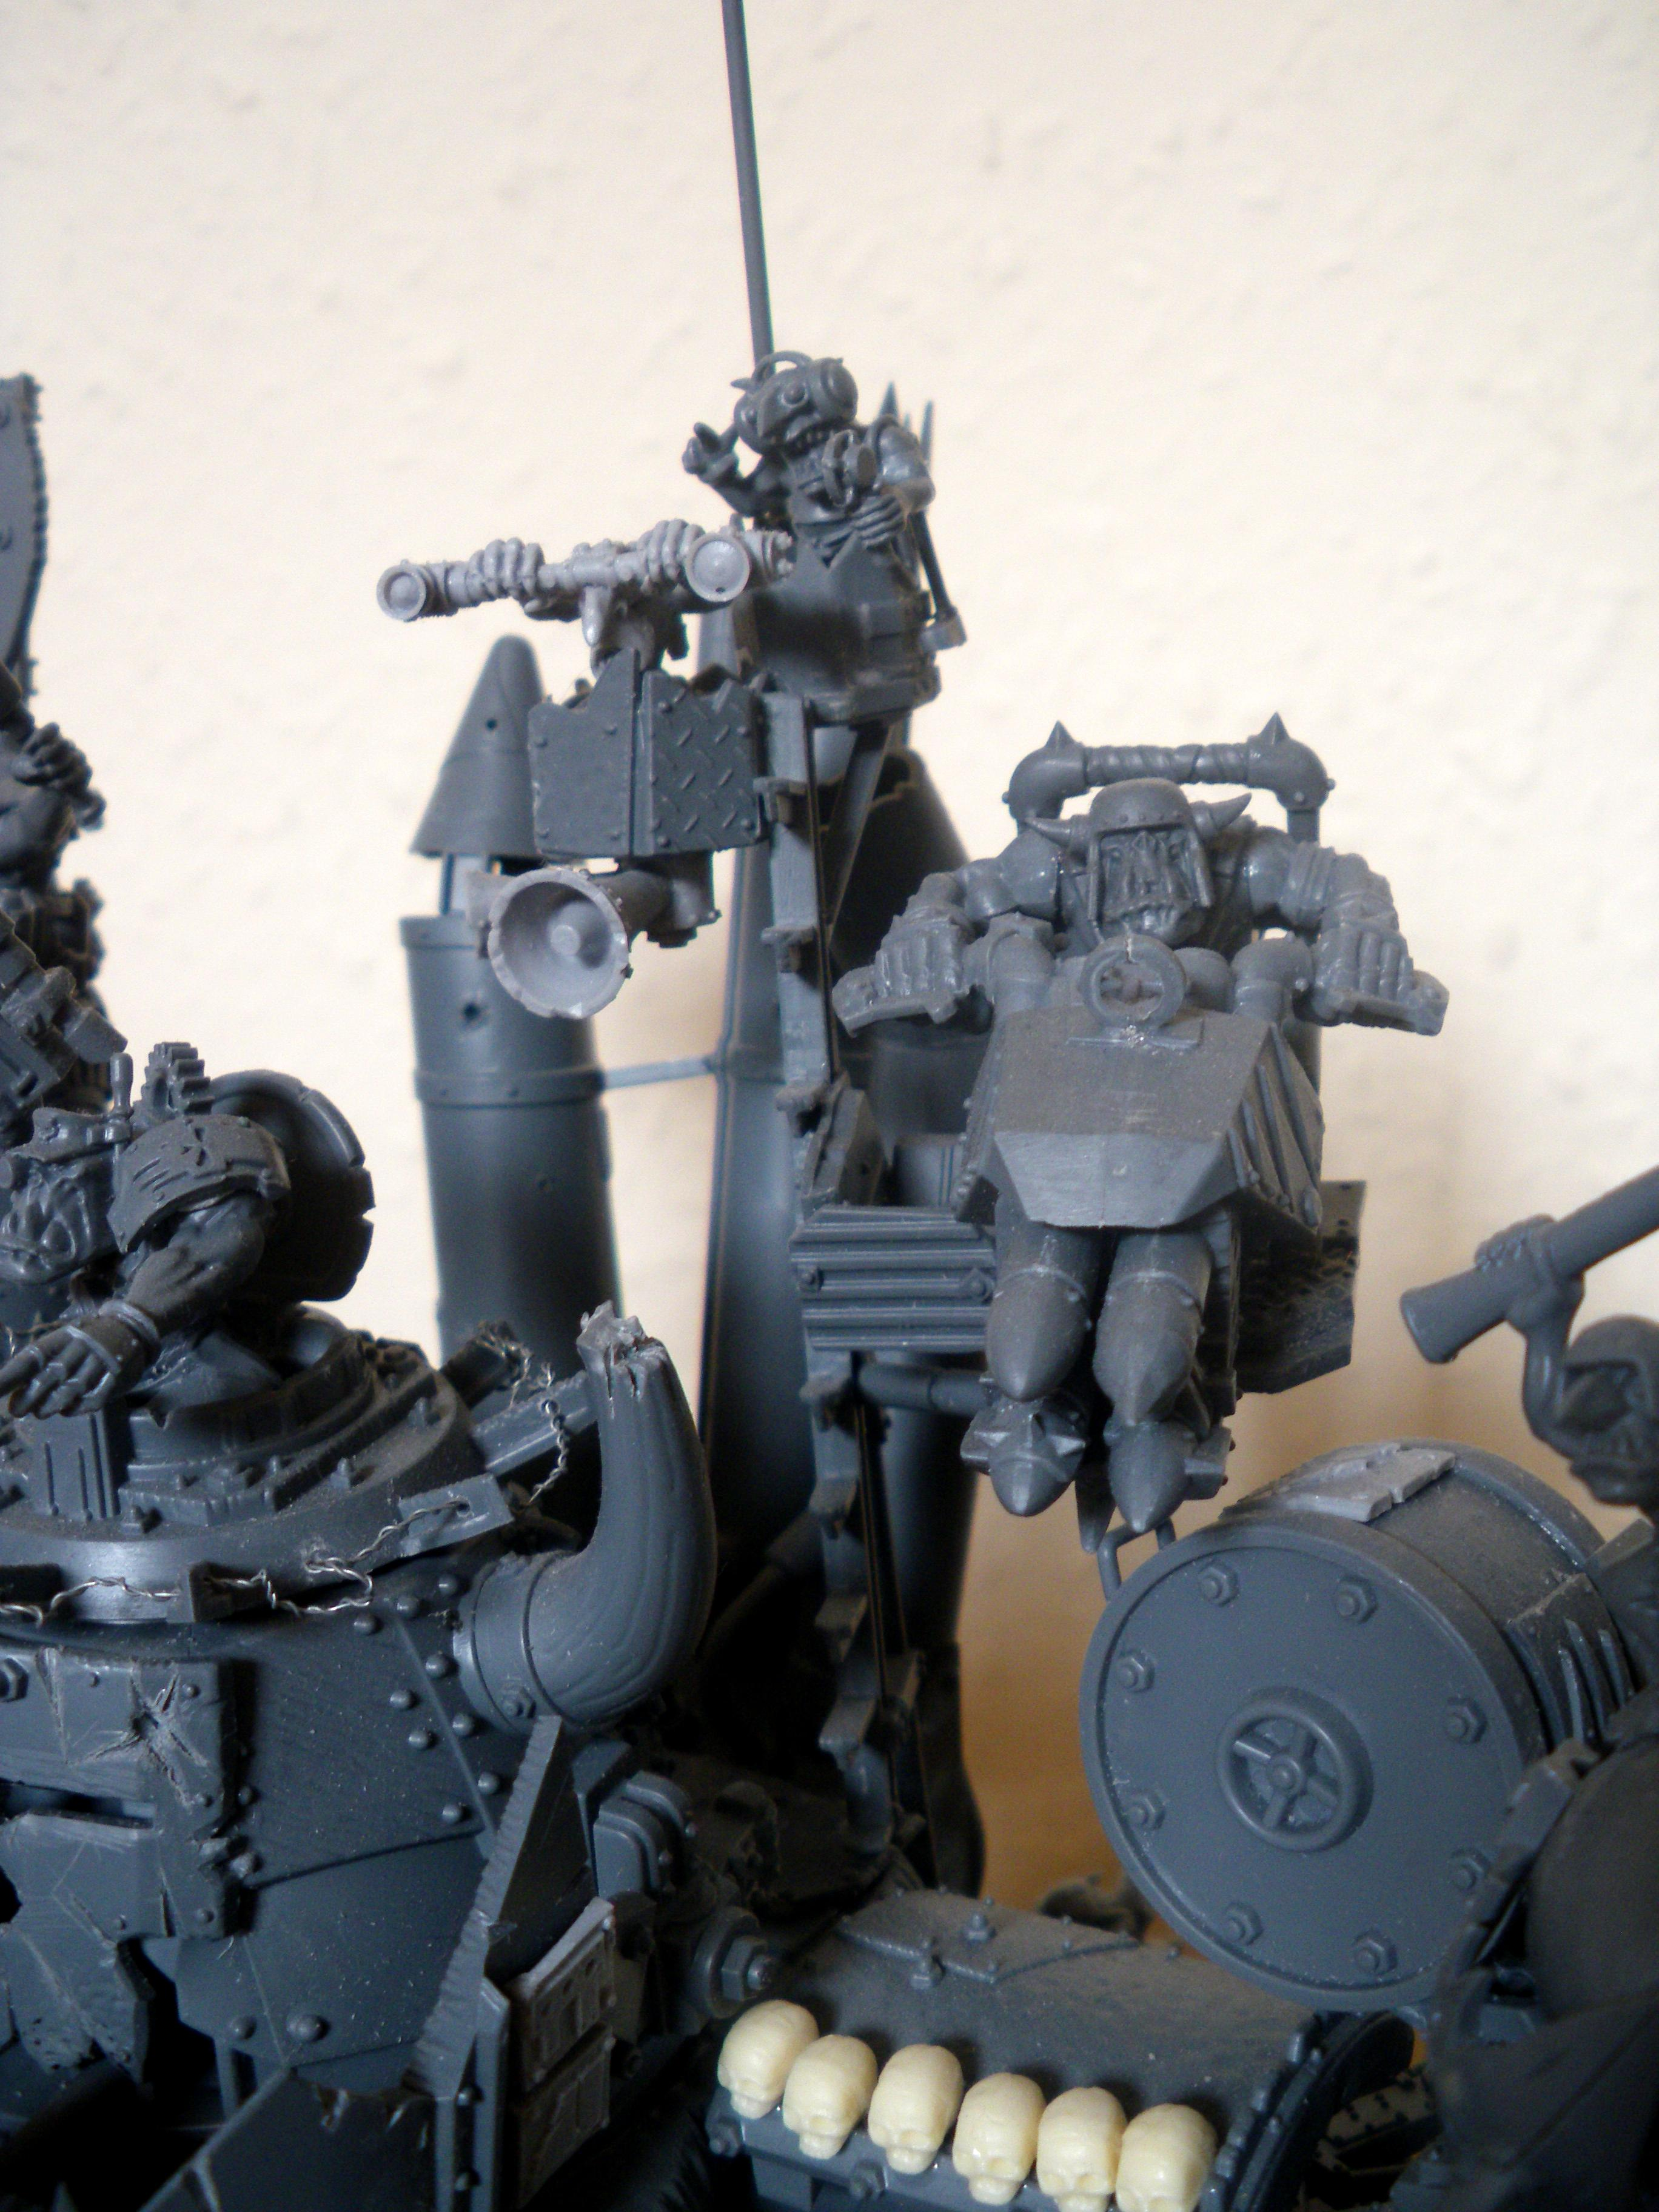 Convershun, Conversion, Grot Nest, Grots, Mekboy, Missile Platform, Modelling, Orks, Project, Stompa, Work In Progress